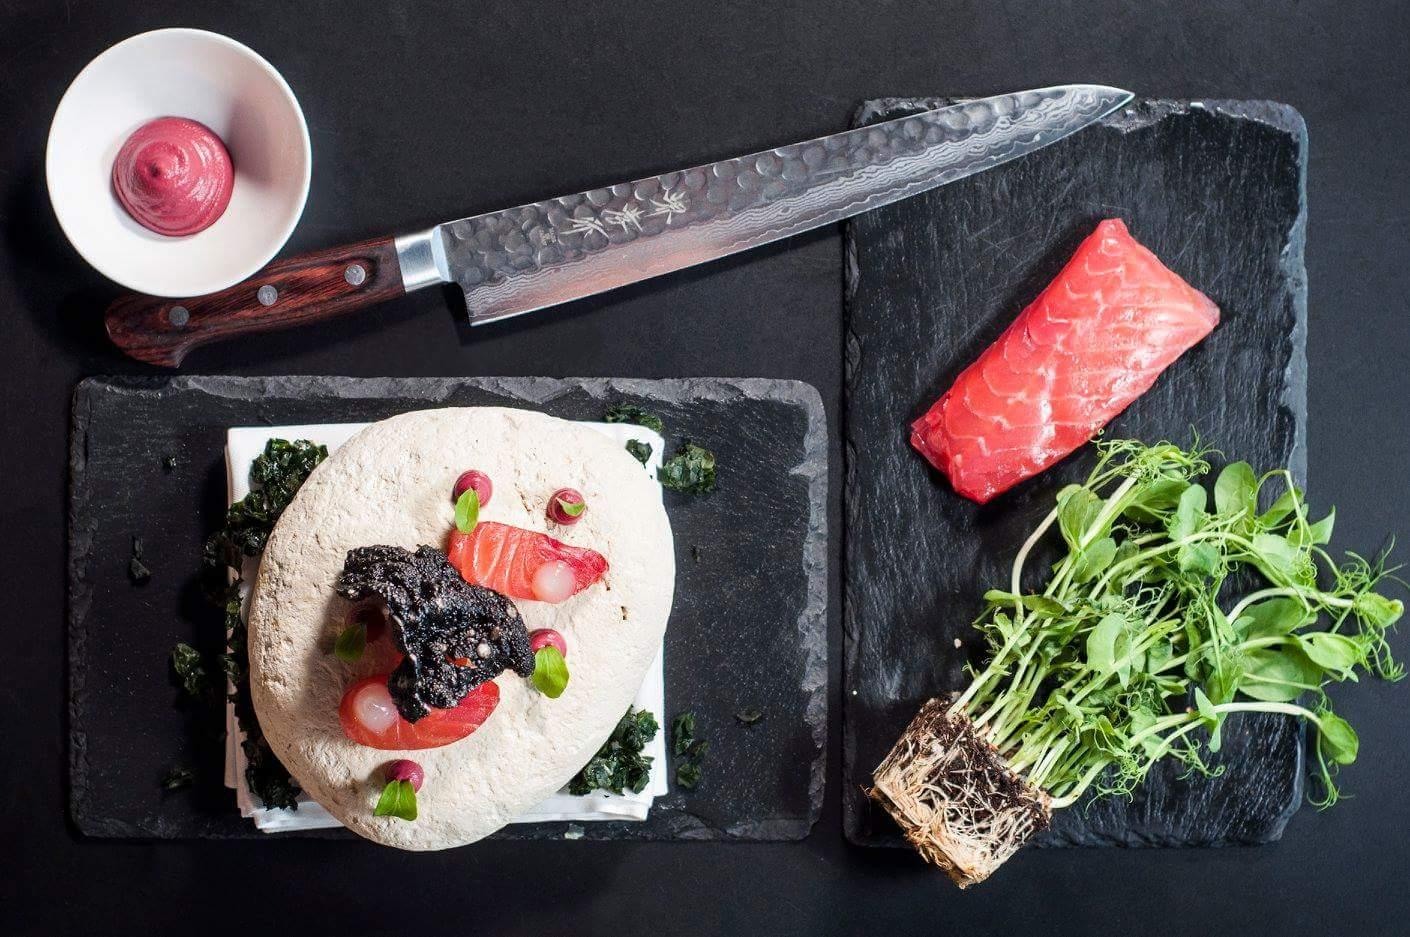 Beetroot cured salmon, yuzu, tapioca by chef James Oakley, Alibi restaurant in Hong Kong